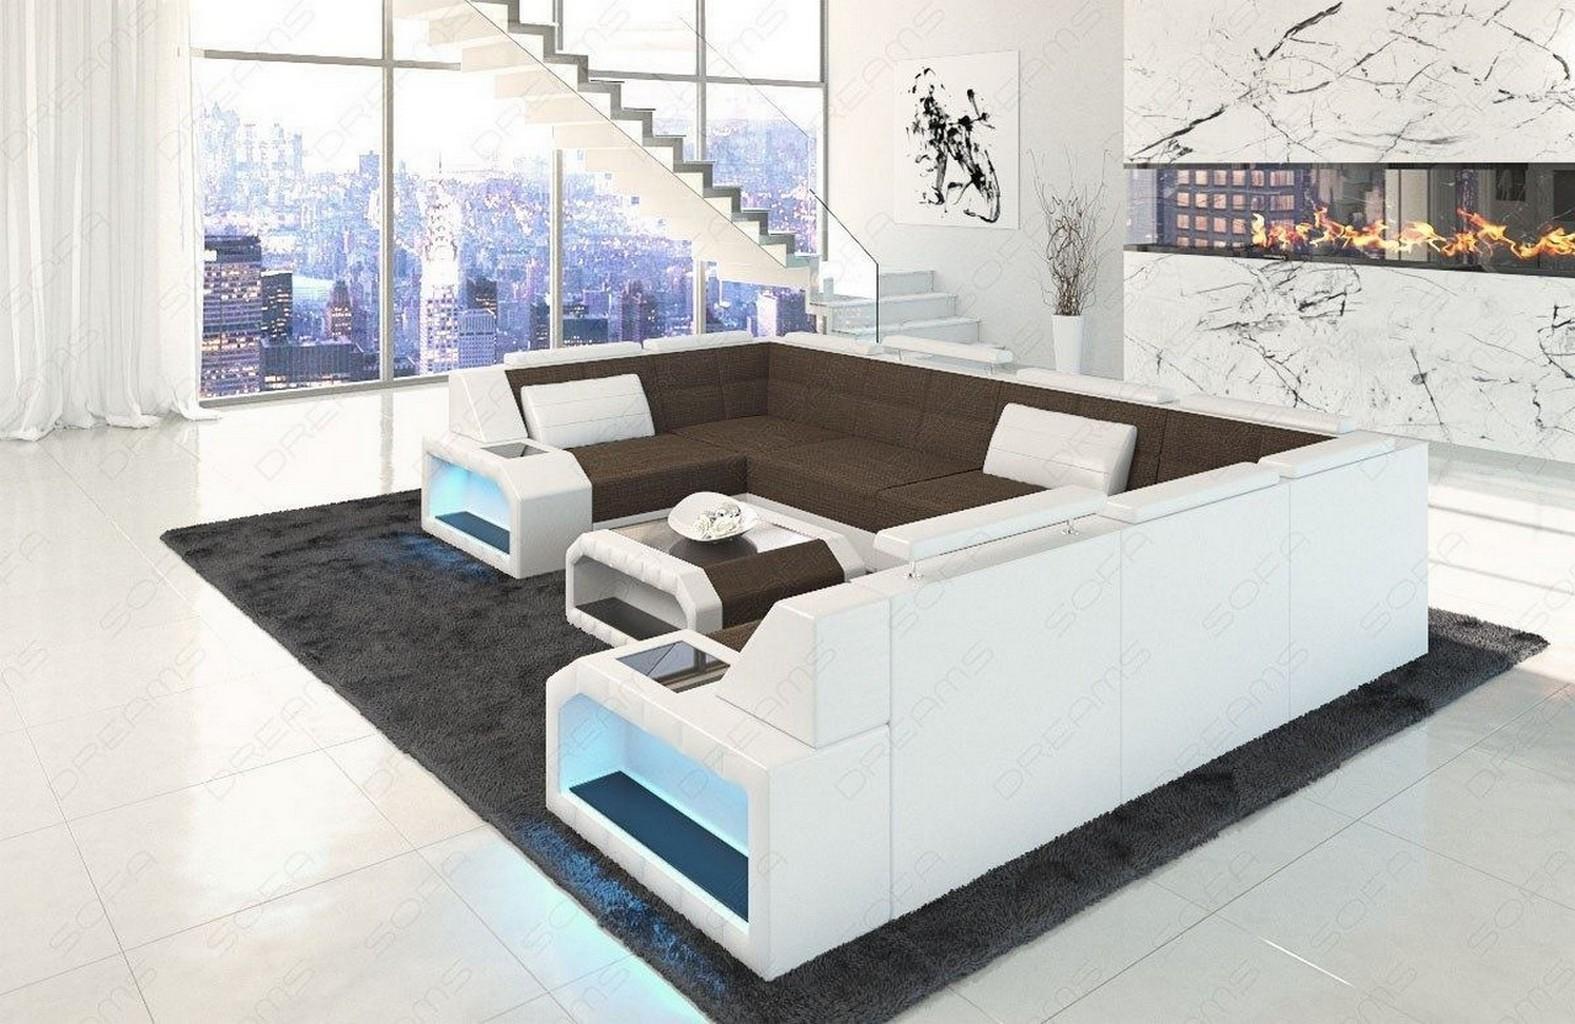 pigmentflecken lasern heilung 3sat. Black Bedroom Furniture Sets. Home Design Ideas